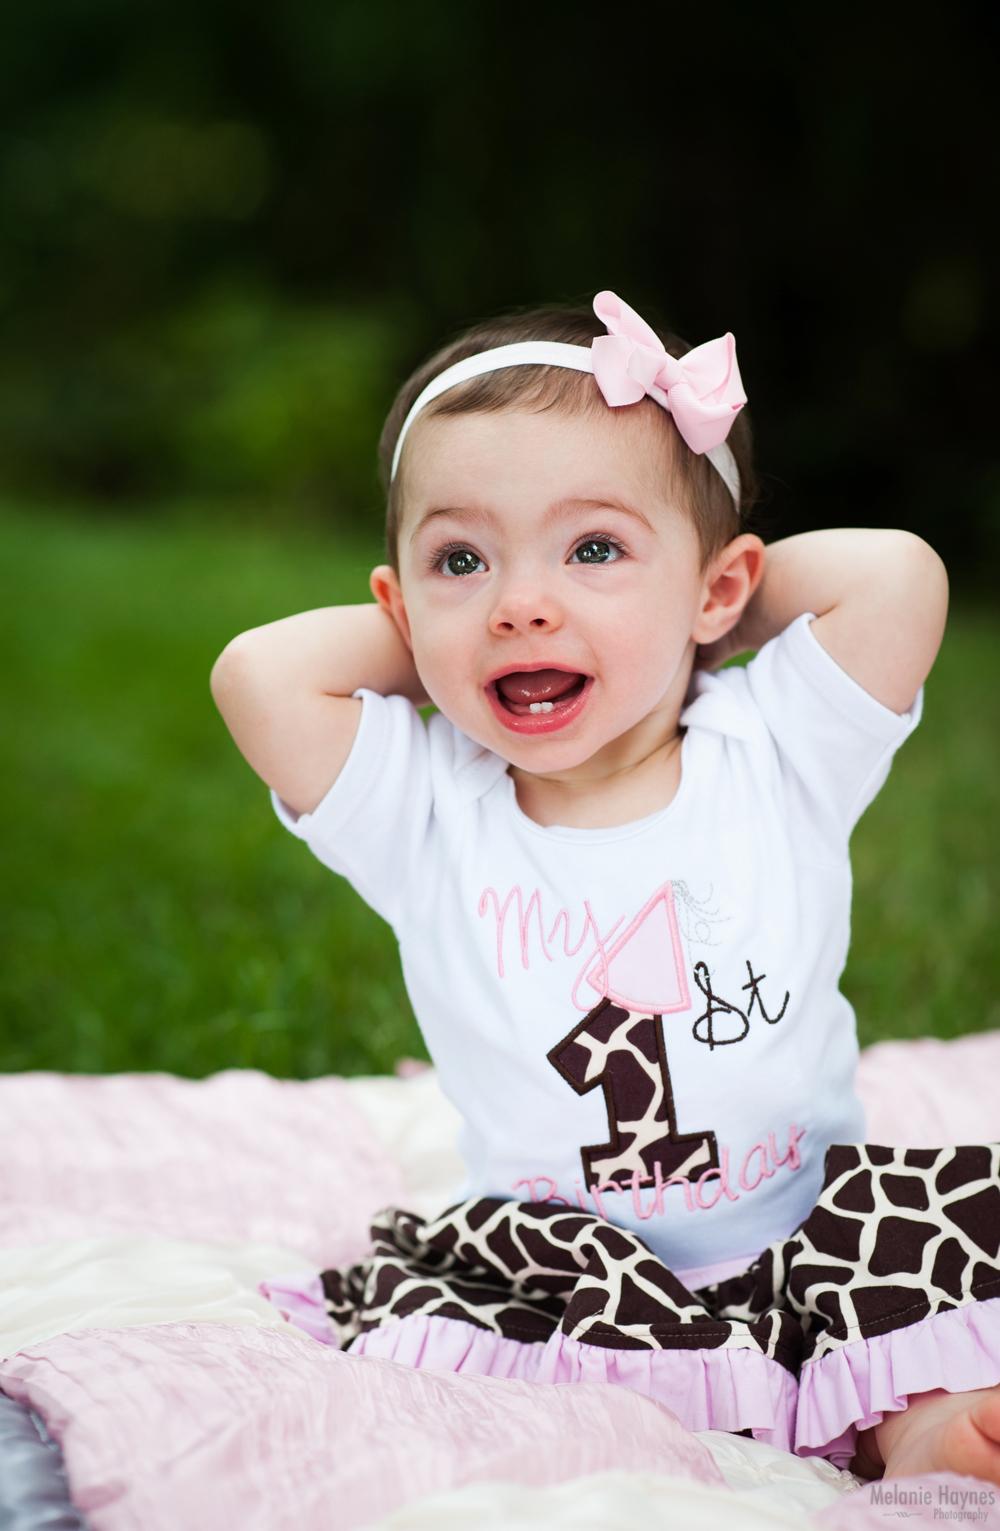 mhaynesphoto_childrensphotography_e6